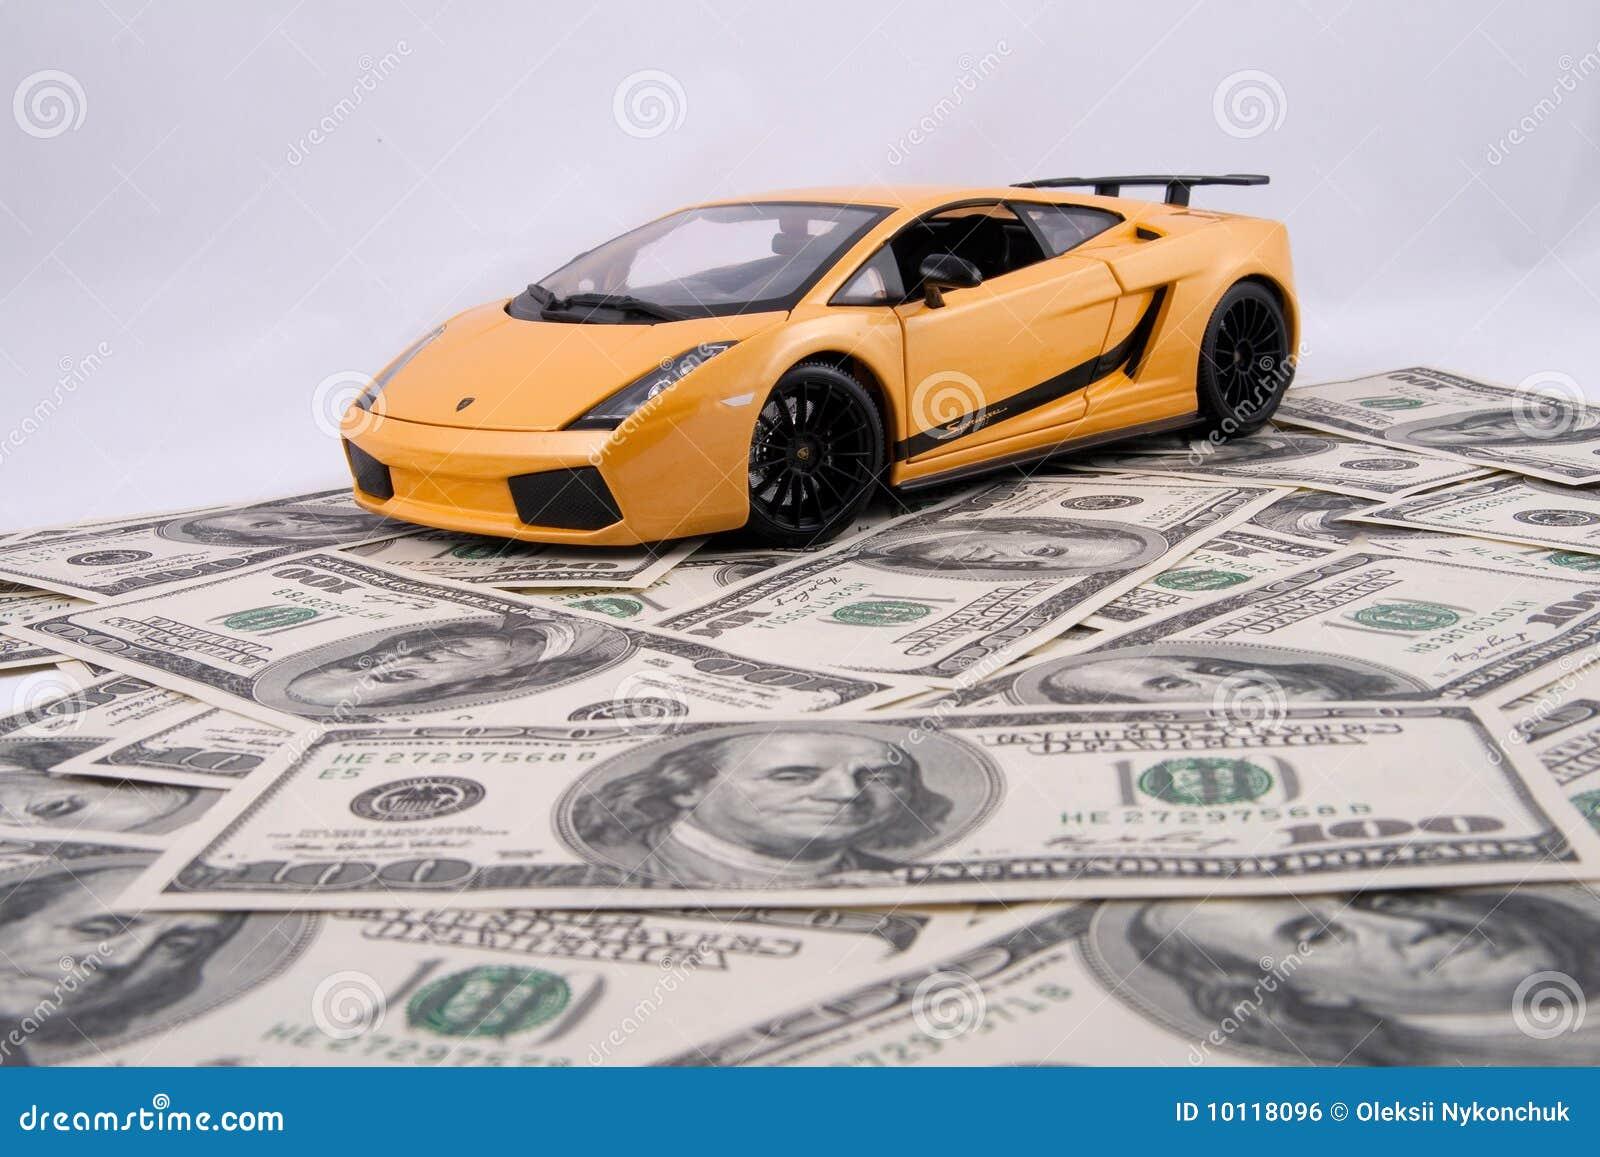 Toy Car On Money Background Royalty Free Stock Image ...